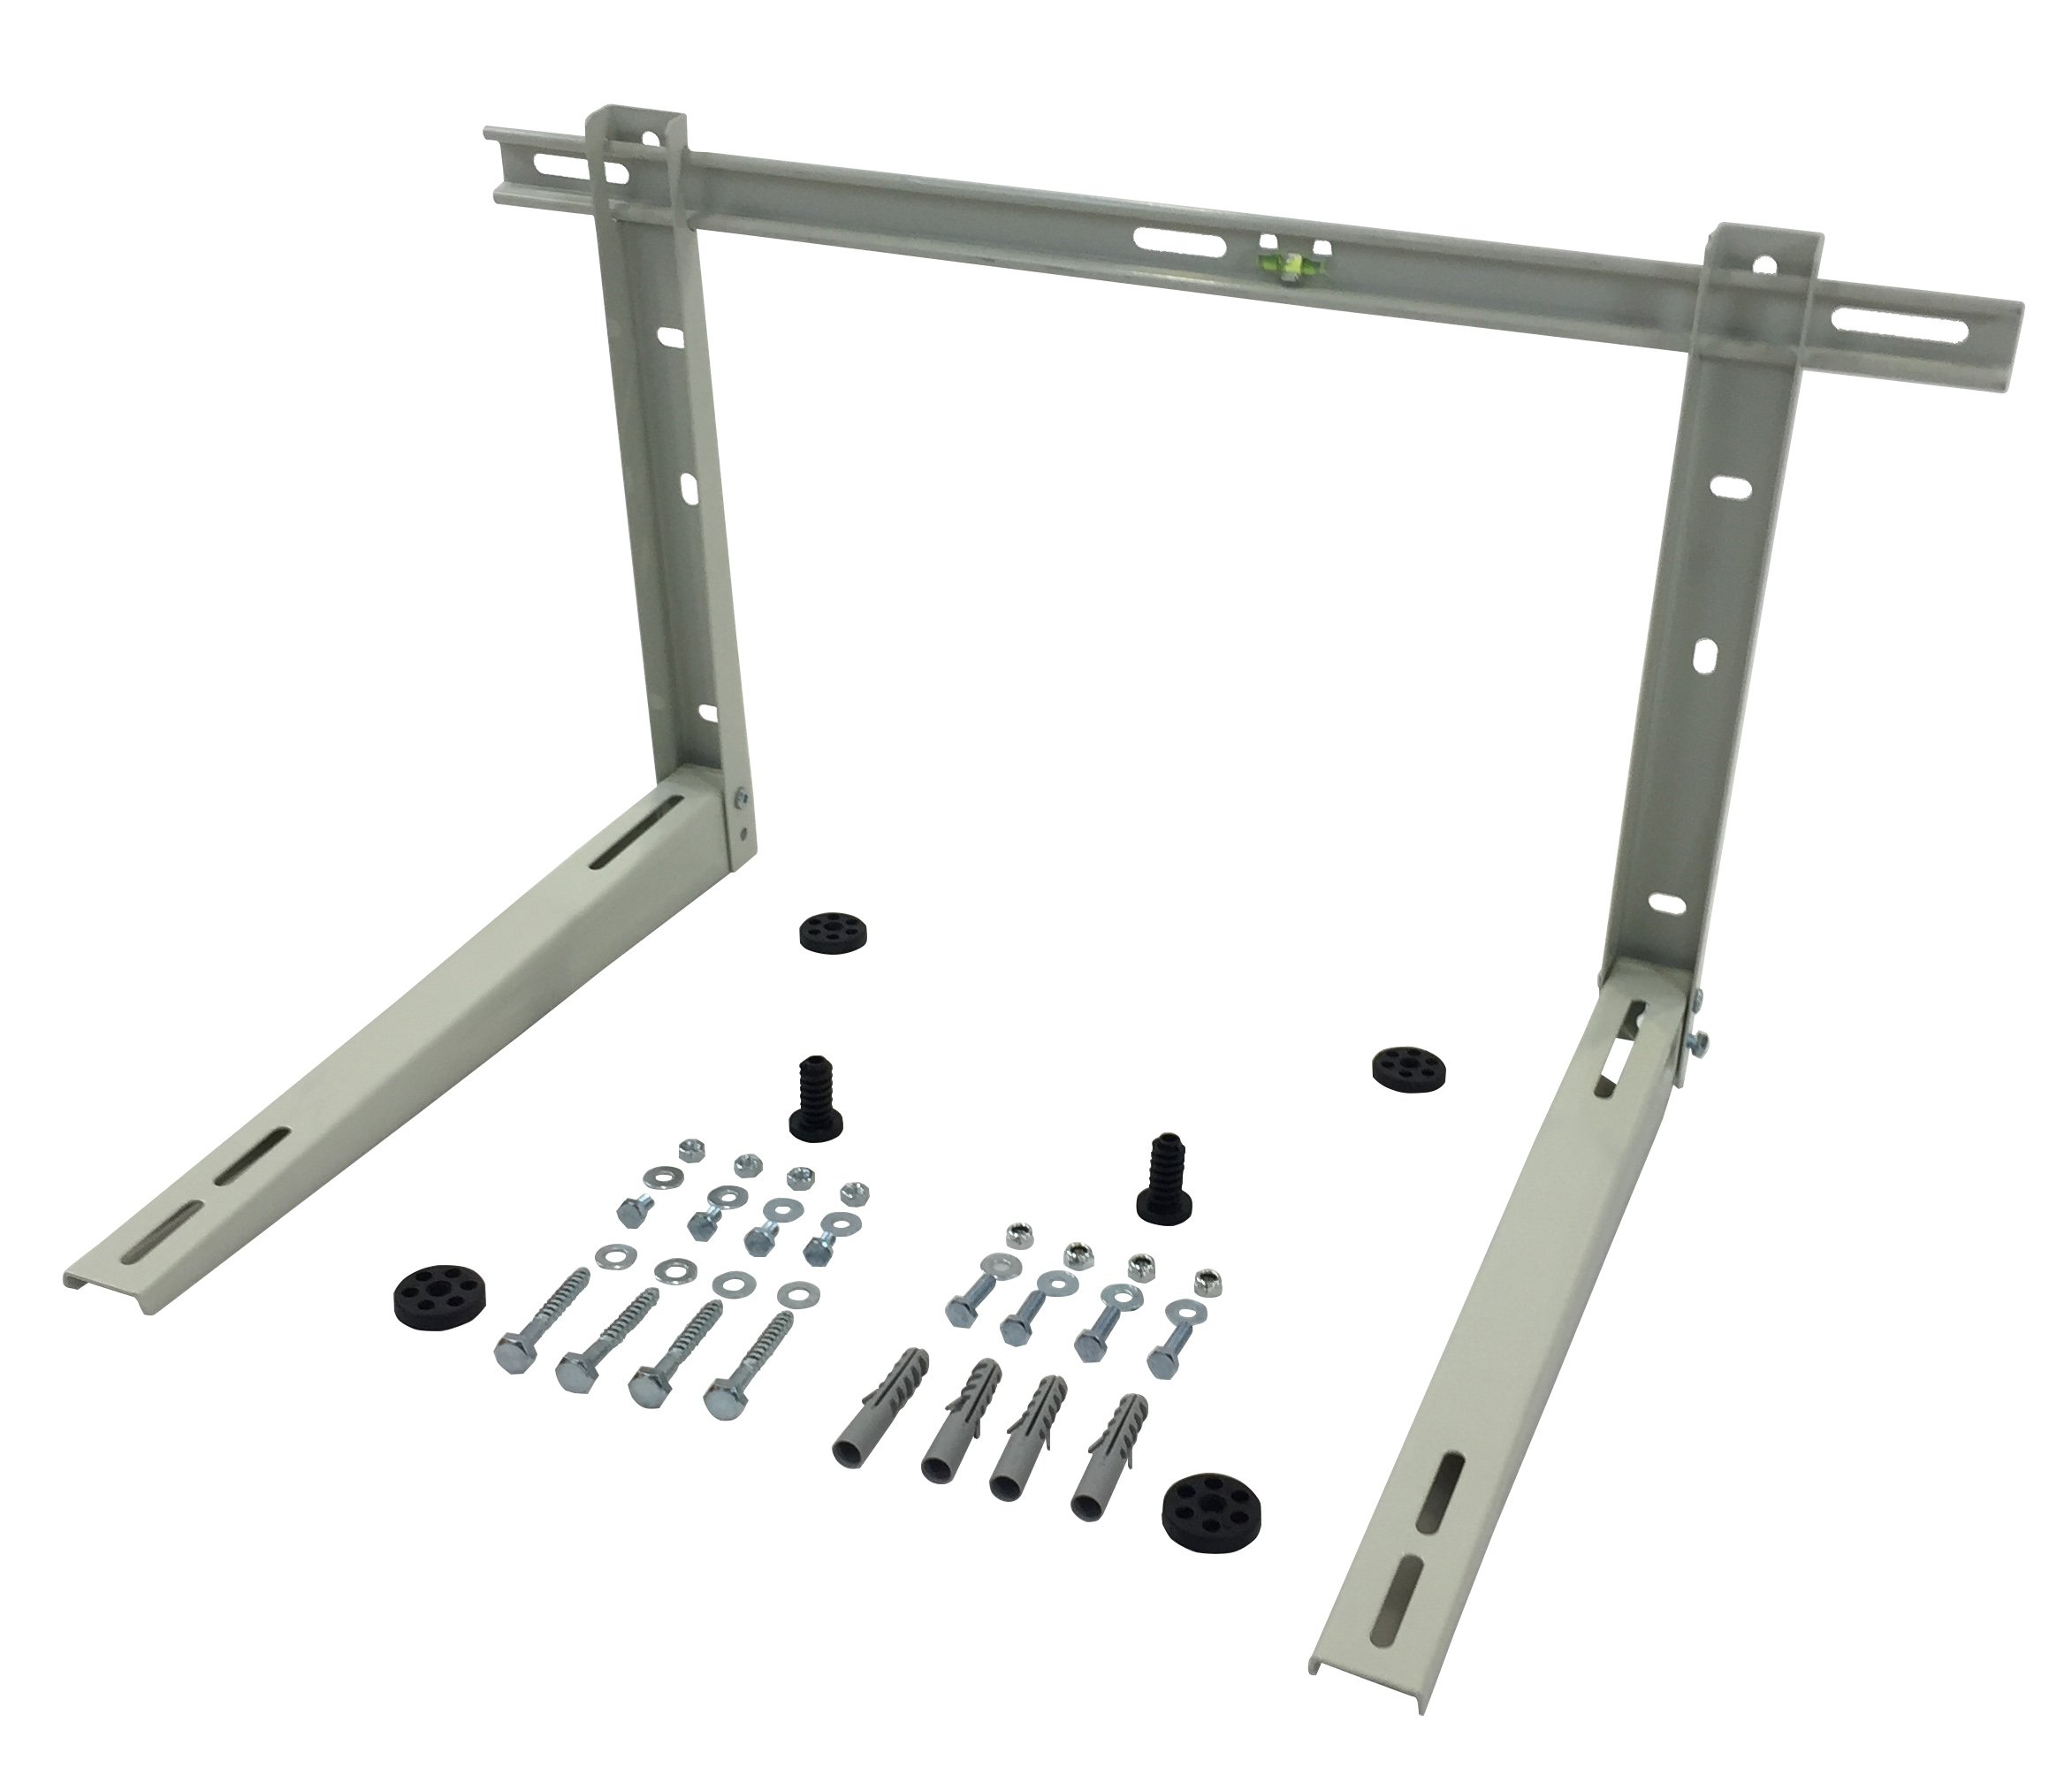 Outdoor Wall Mounting Bracket for Air Conditioner Condensing Unit (9K BTU to 24K BTU Crossbar)